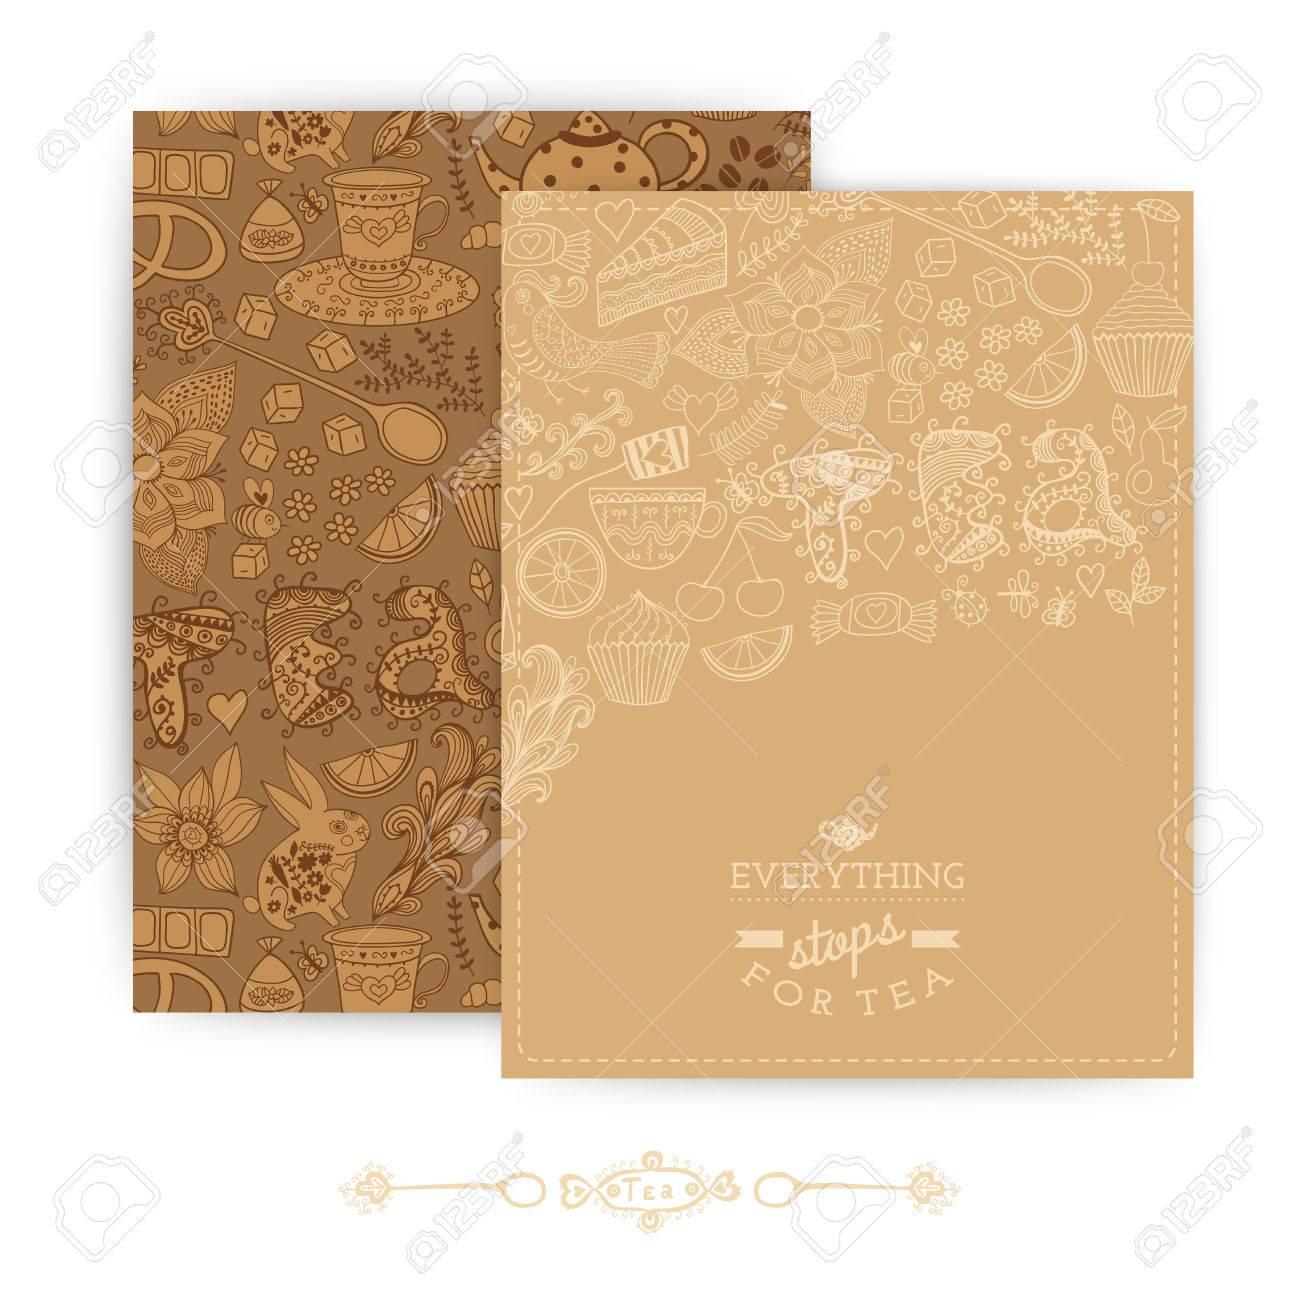 Tee-Markendesign. Kaffee Und Tee Design-Set-Karten. Süßes Muster ...